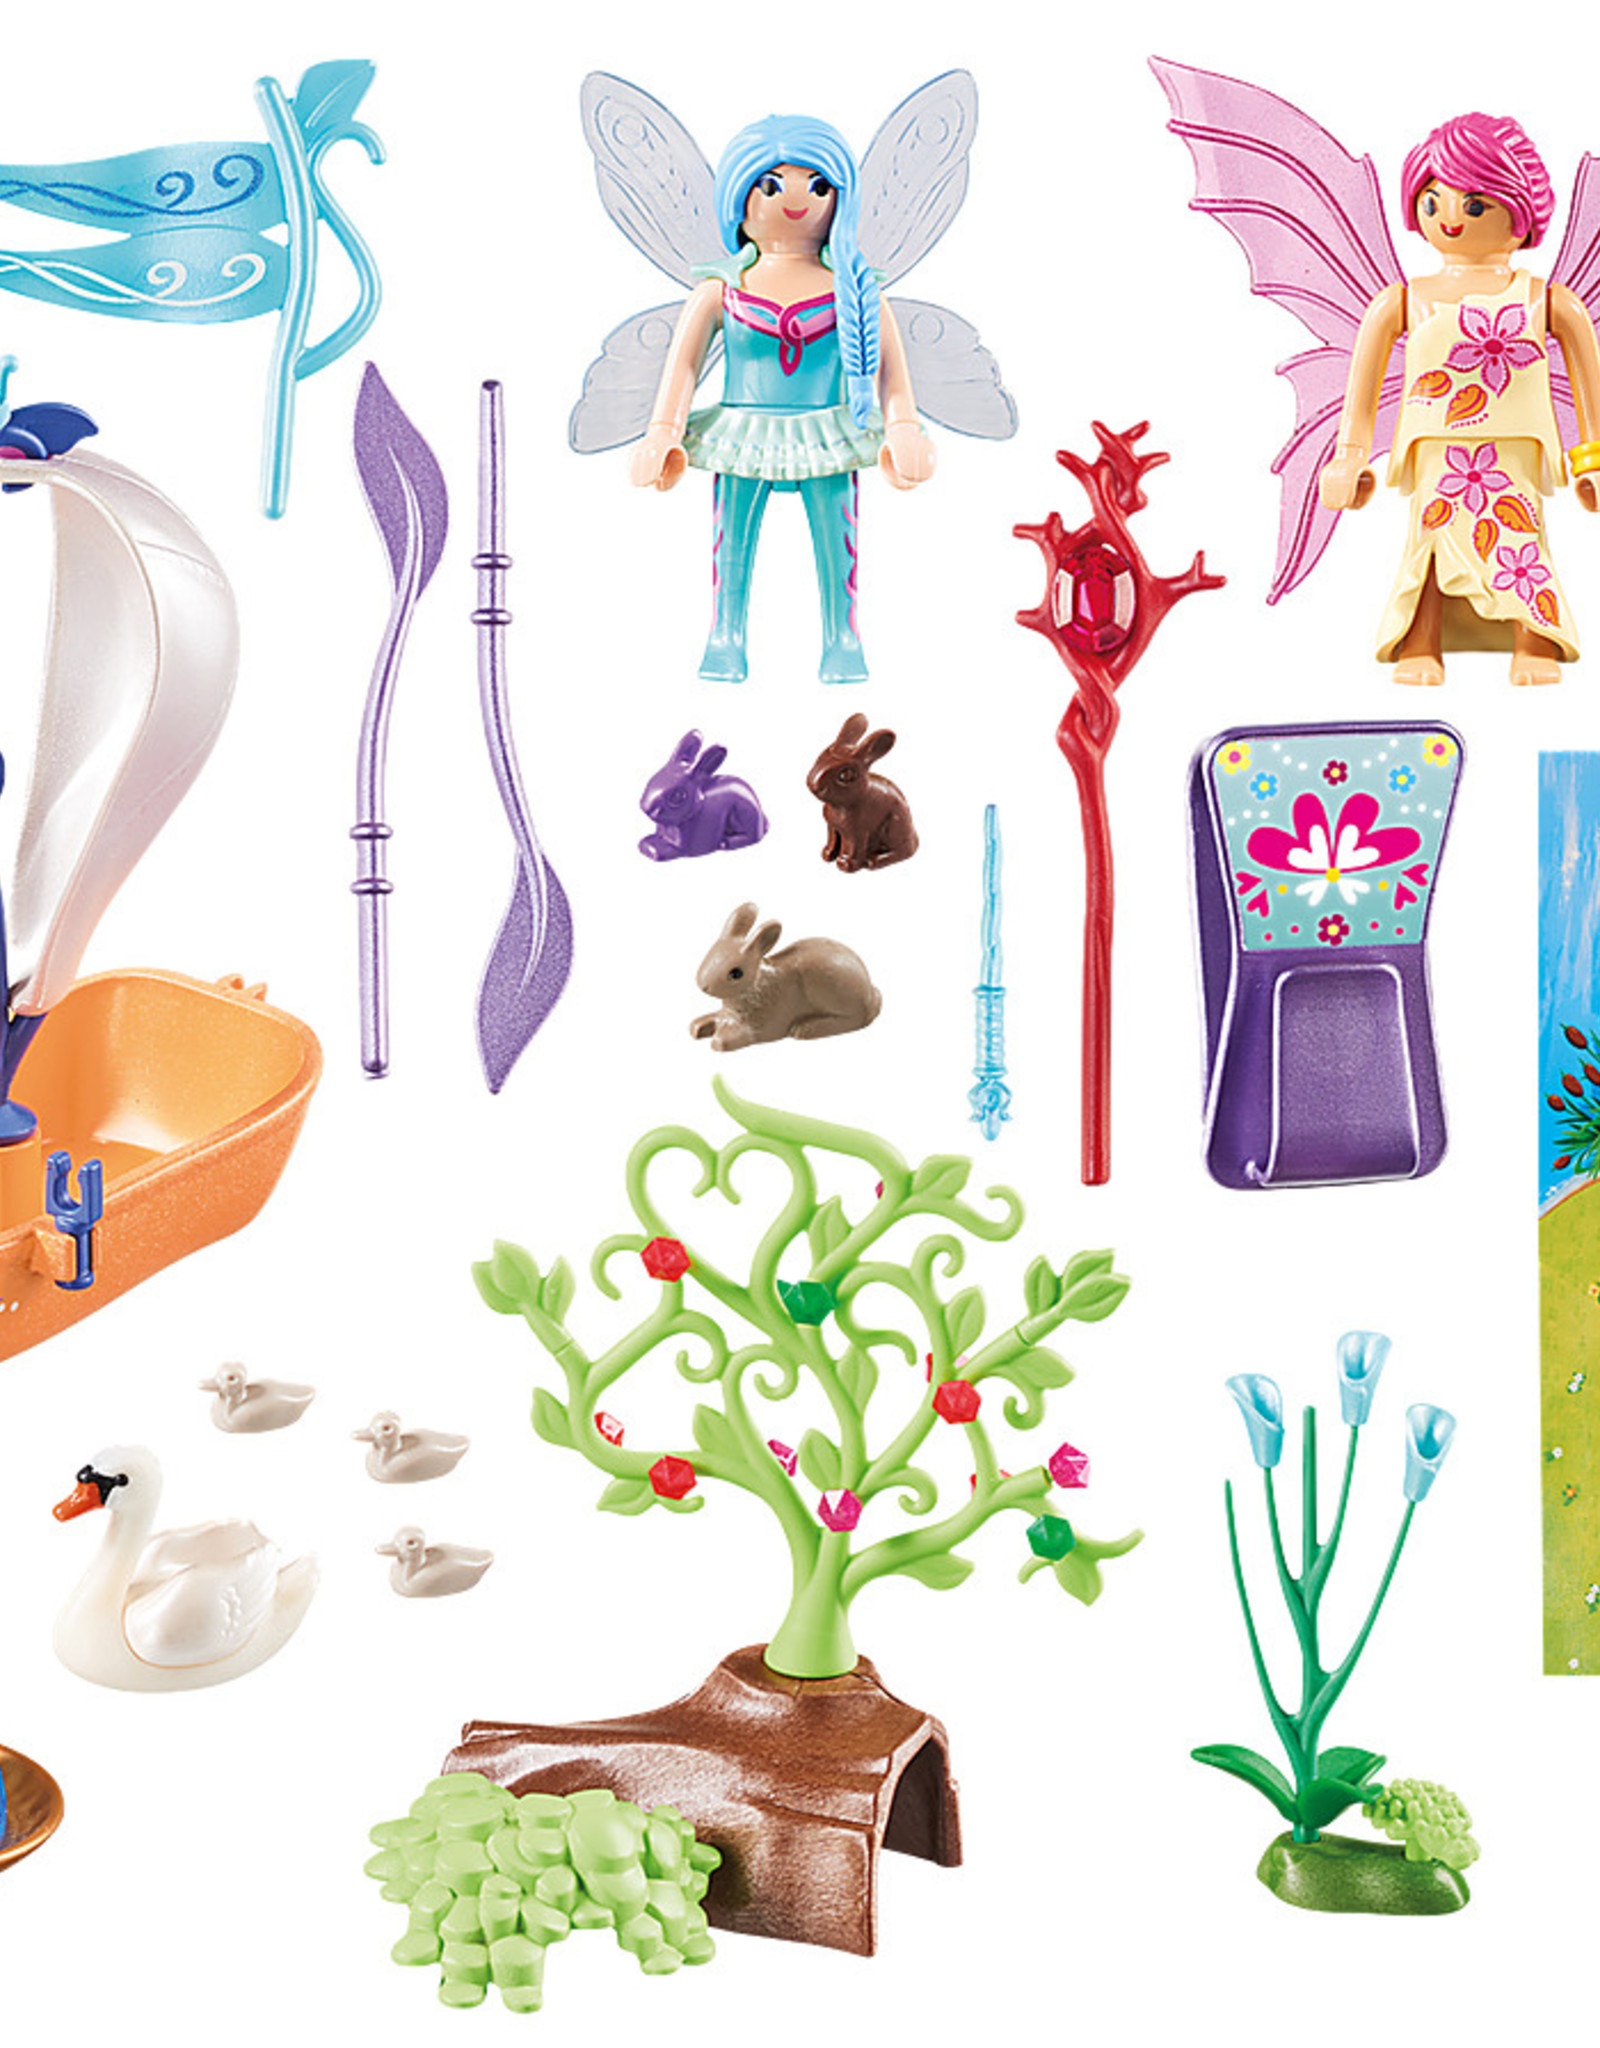 playmobil Playmobil - Fairy Garden Play Map